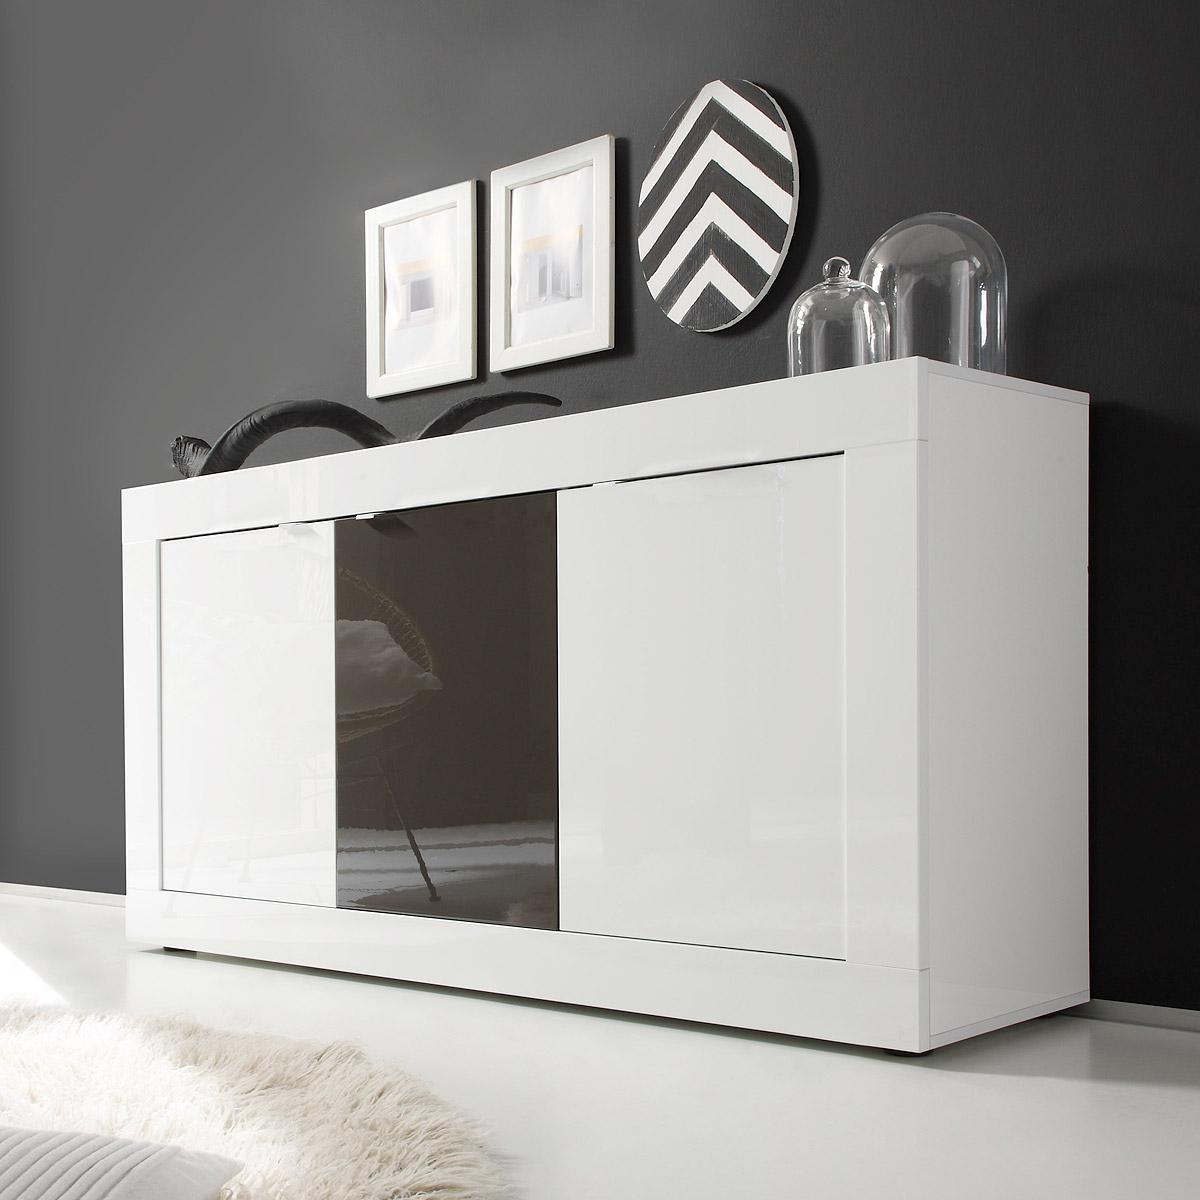 sideboard basic kommode wei und anthrazit lackiert b 160 cm. Black Bedroom Furniture Sets. Home Design Ideas